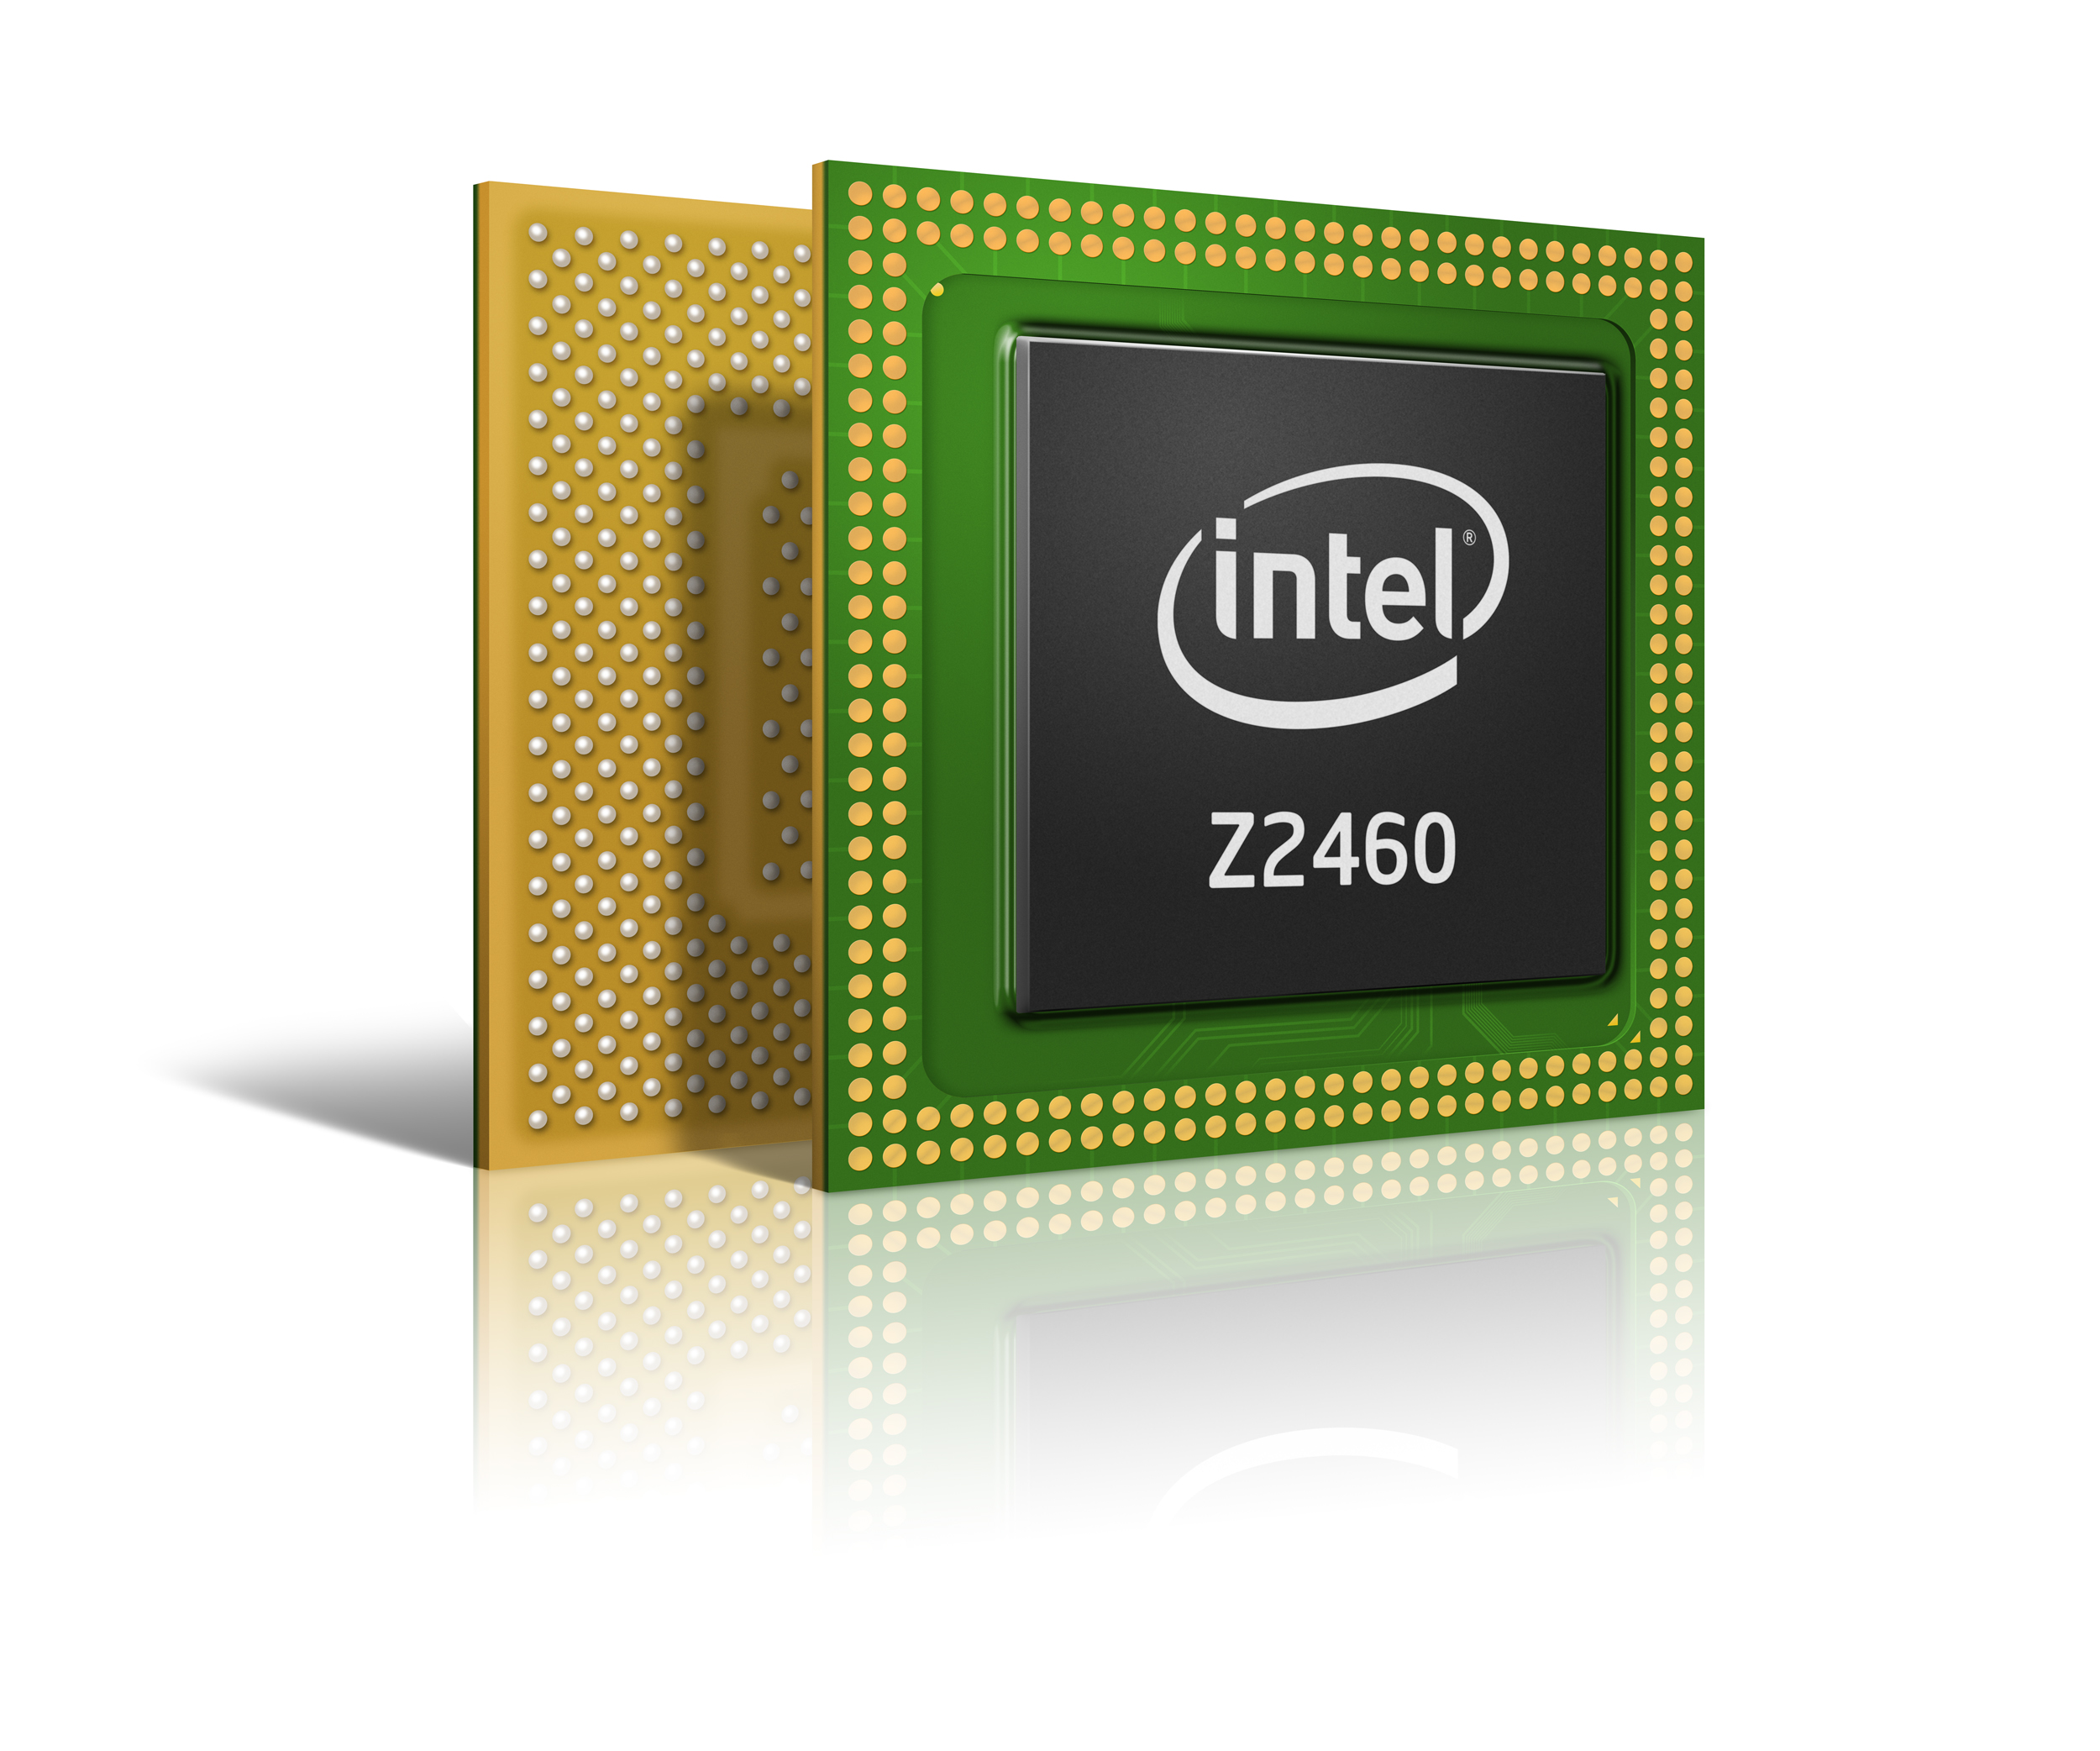 Intel_Atom_Processor_Z2460_Angle.jpg